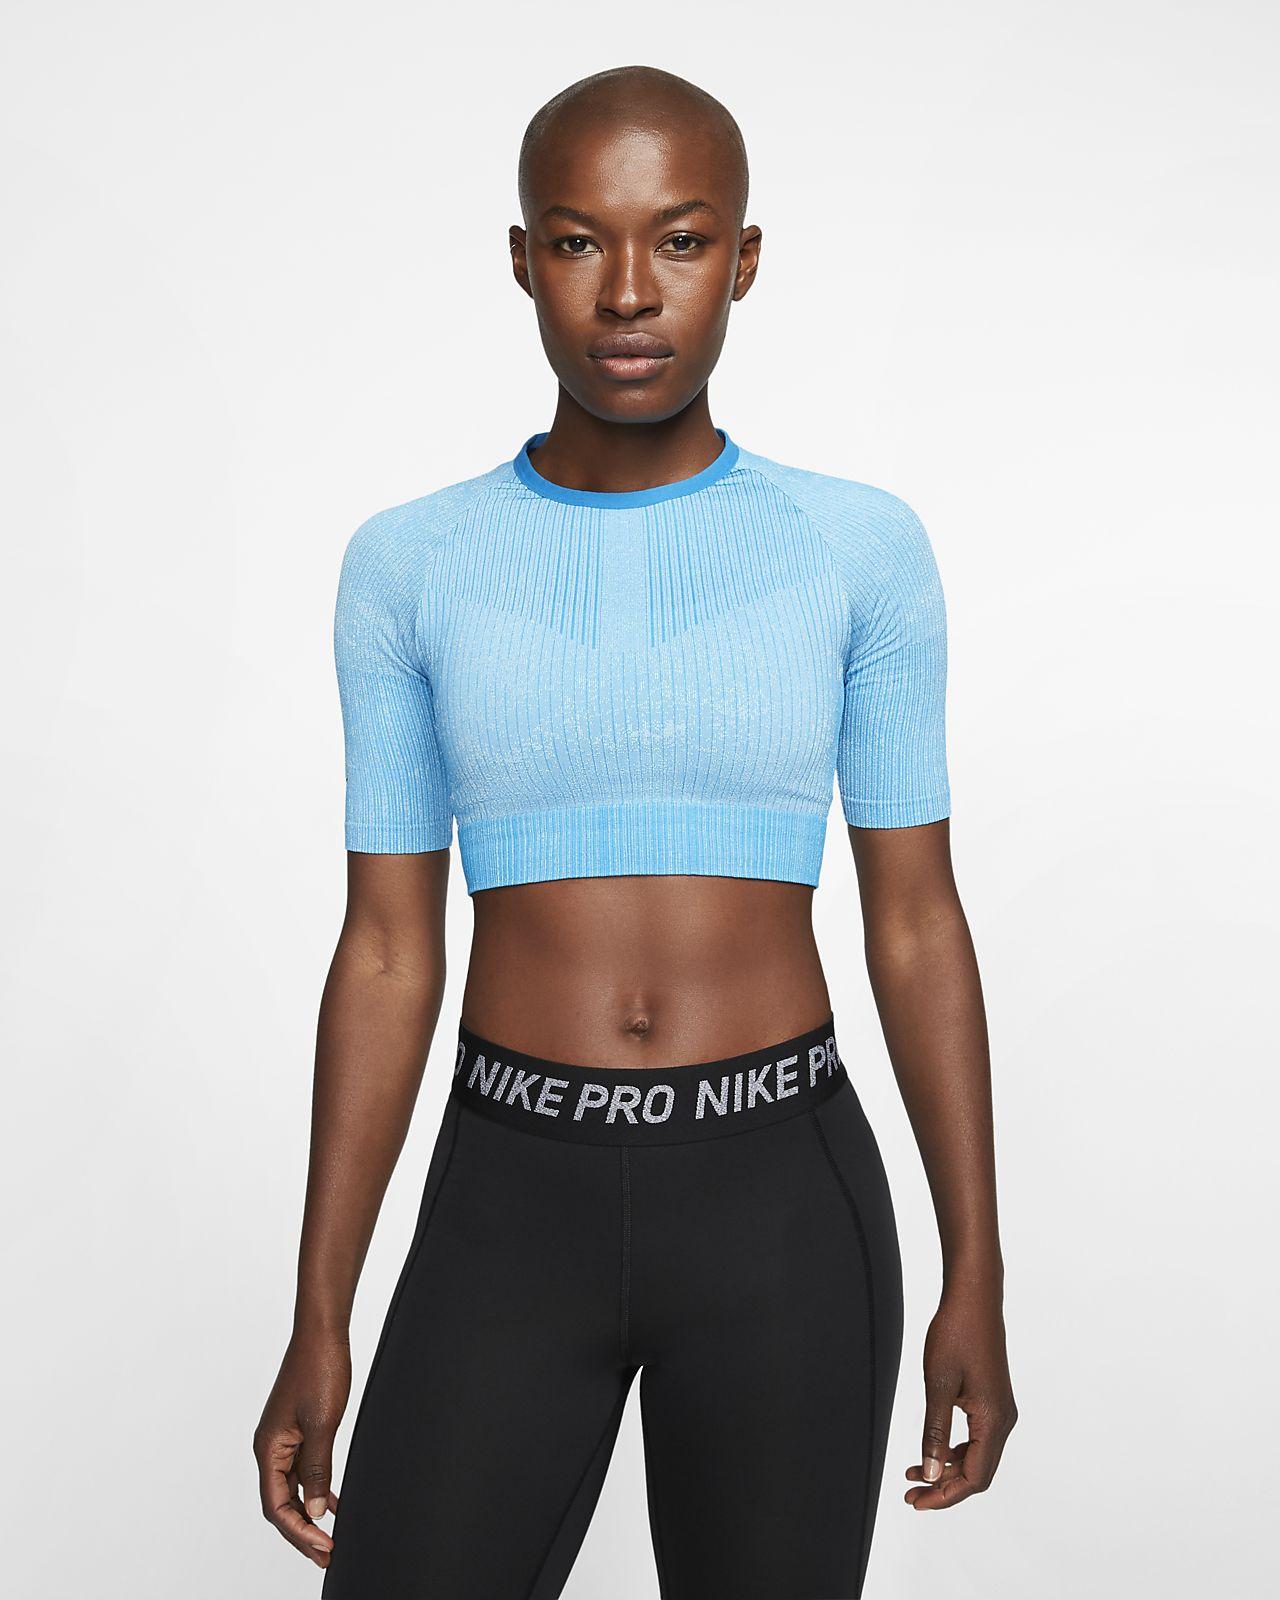 Nike City Ready Women's Knit Training Top